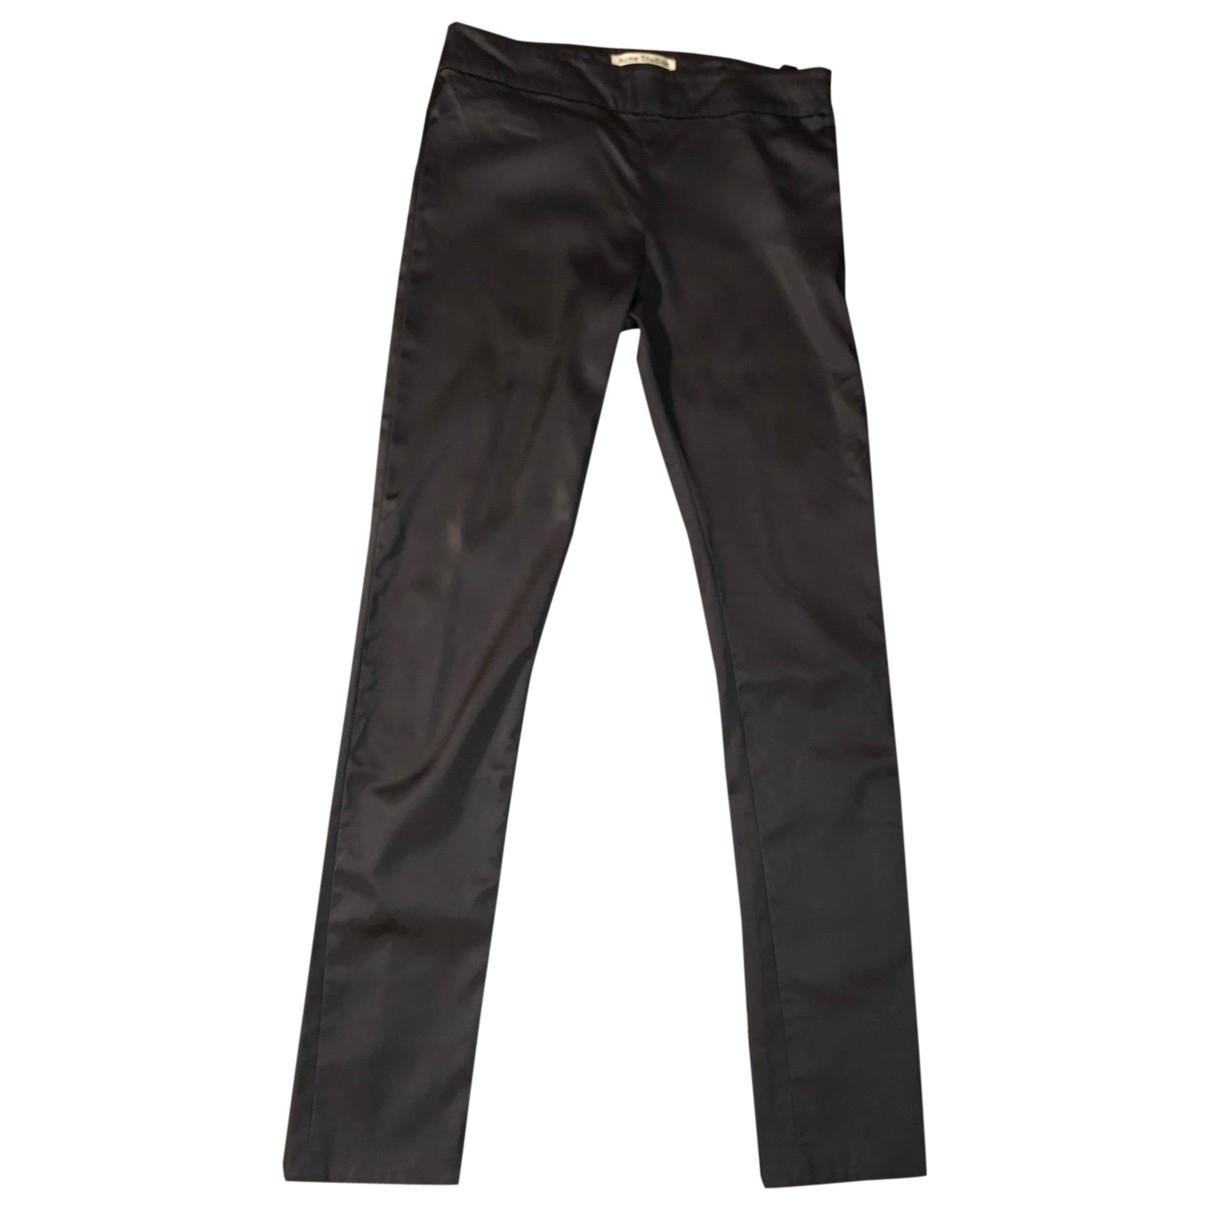 Acne Studios Silk trousers